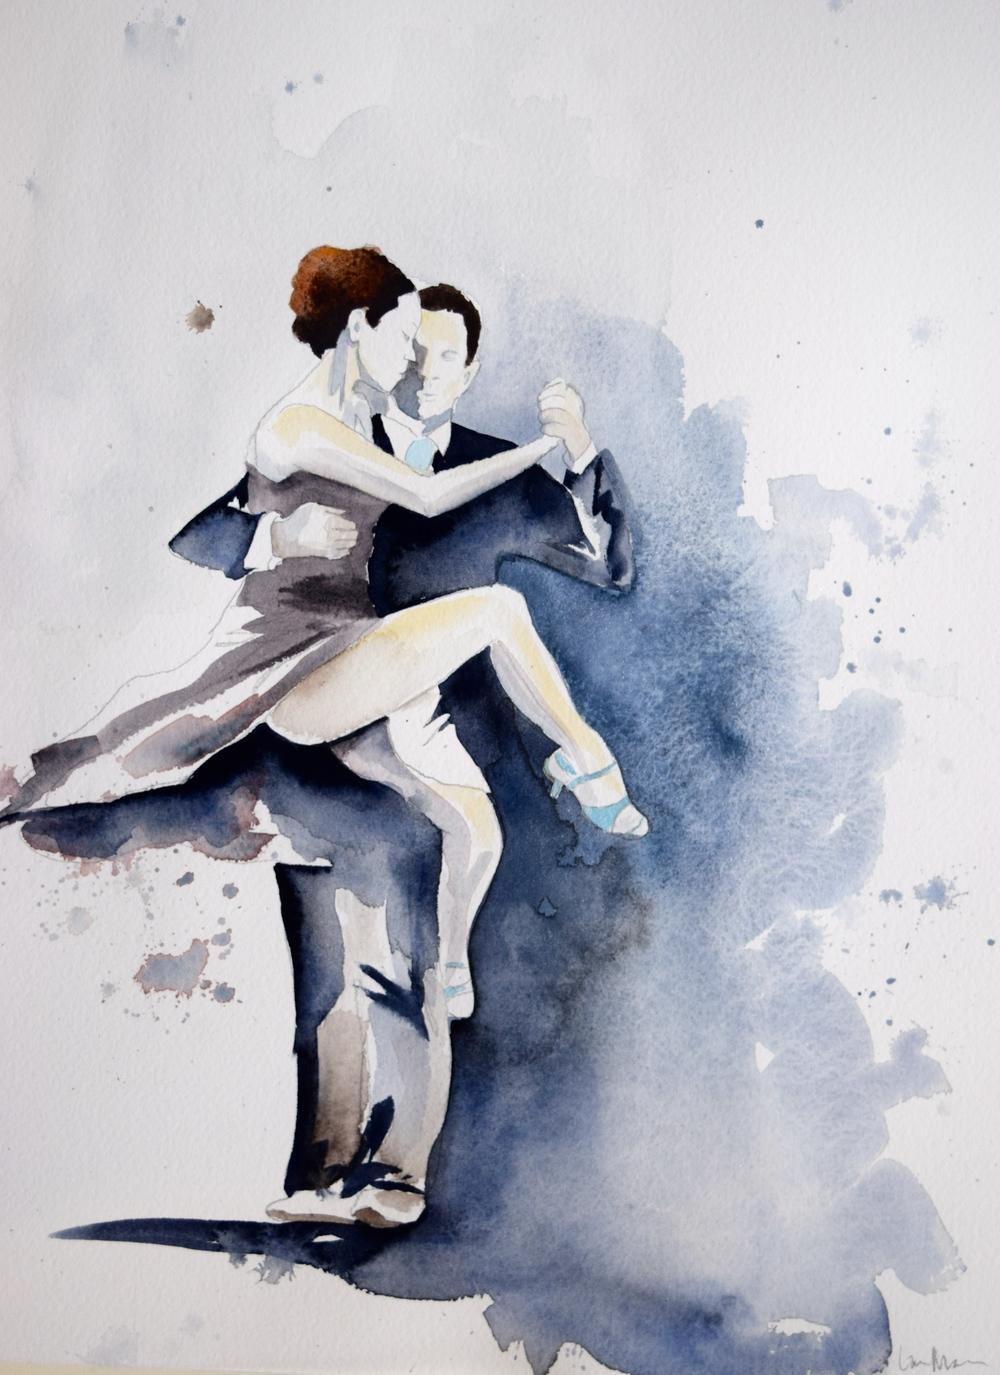 Talking in Circles - 11x14 - watercolor